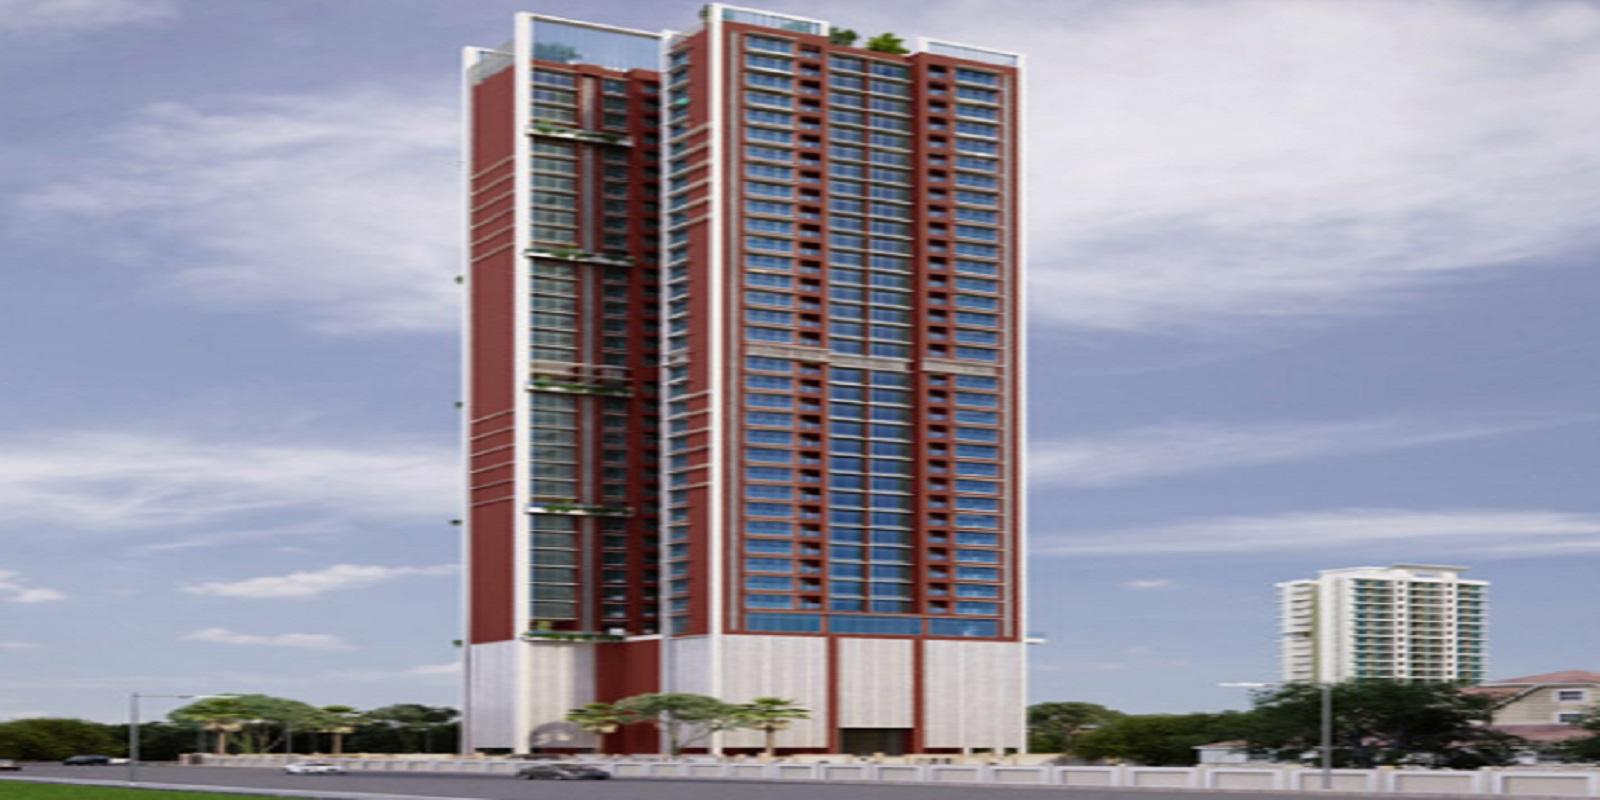 vora skyline centrico project project large image1